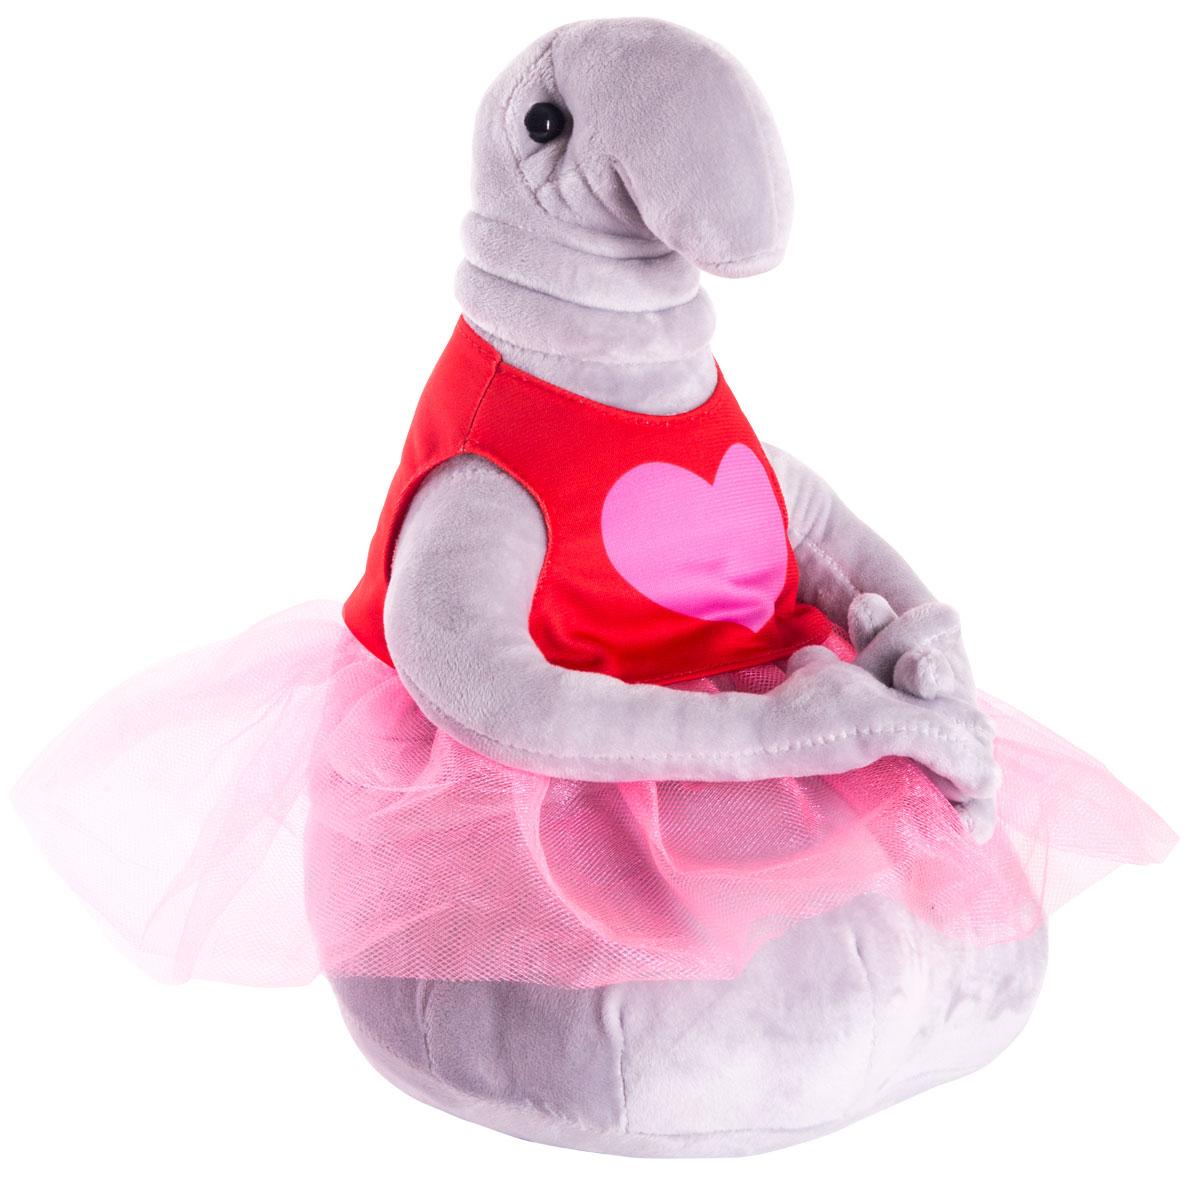 Gulliver Мягкая игрушка Ждун Жду Принца 30 см gulliver мягкая игрушка ждун 30 см